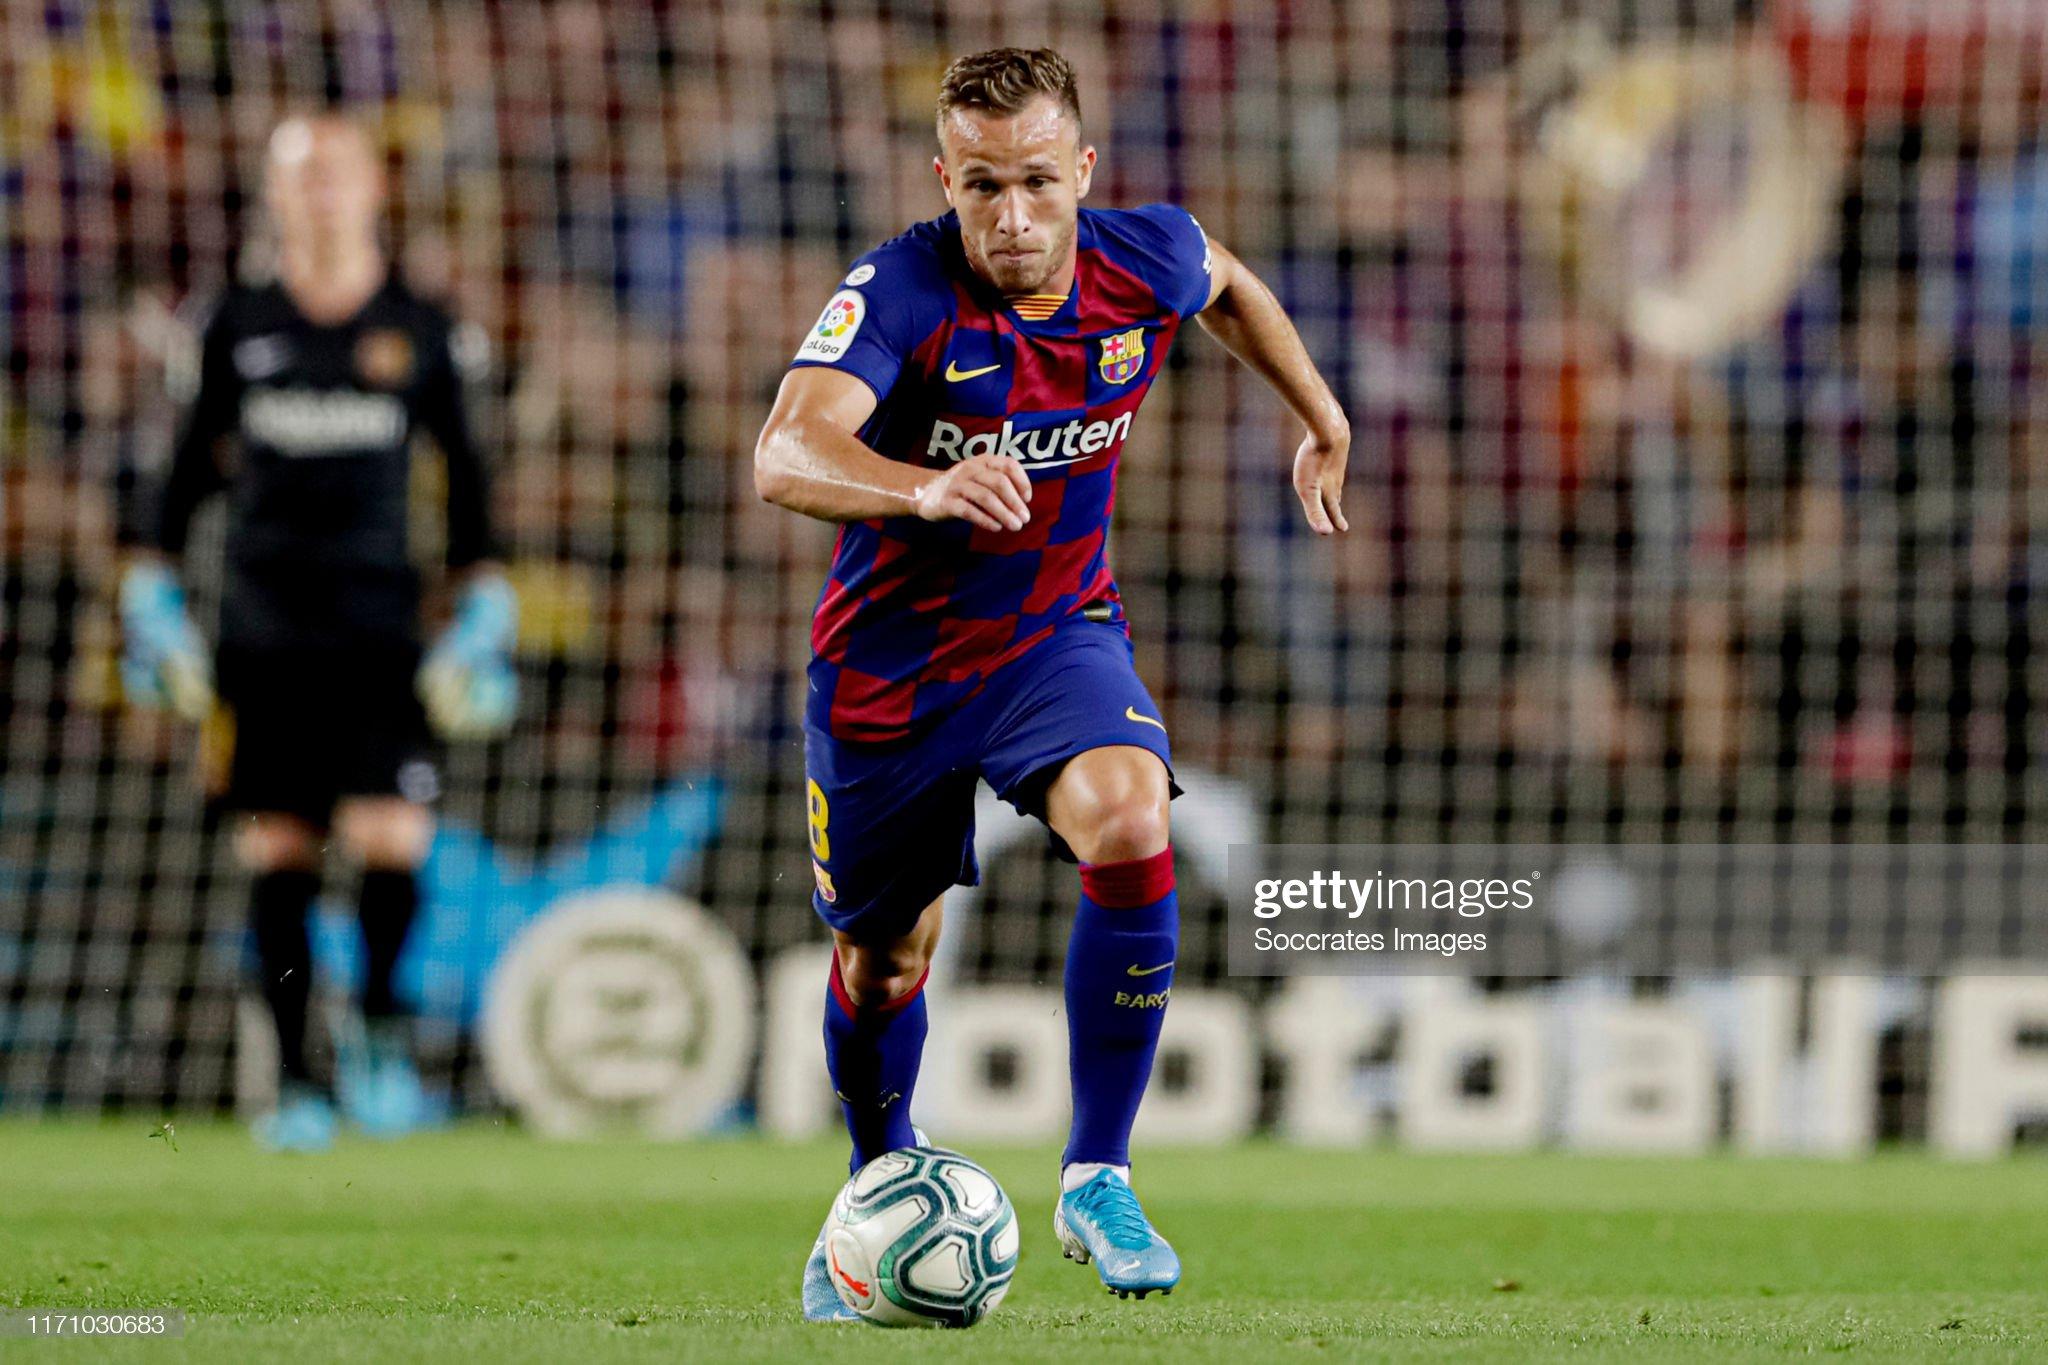 صور مباراة : برشلونة - فياريال 2-1 ( 24-09-2019 )  Arthur-of-fc-barcelona-during-the-la-liga-santander-match-between-fc-picture-id1171030683?s=2048x2048